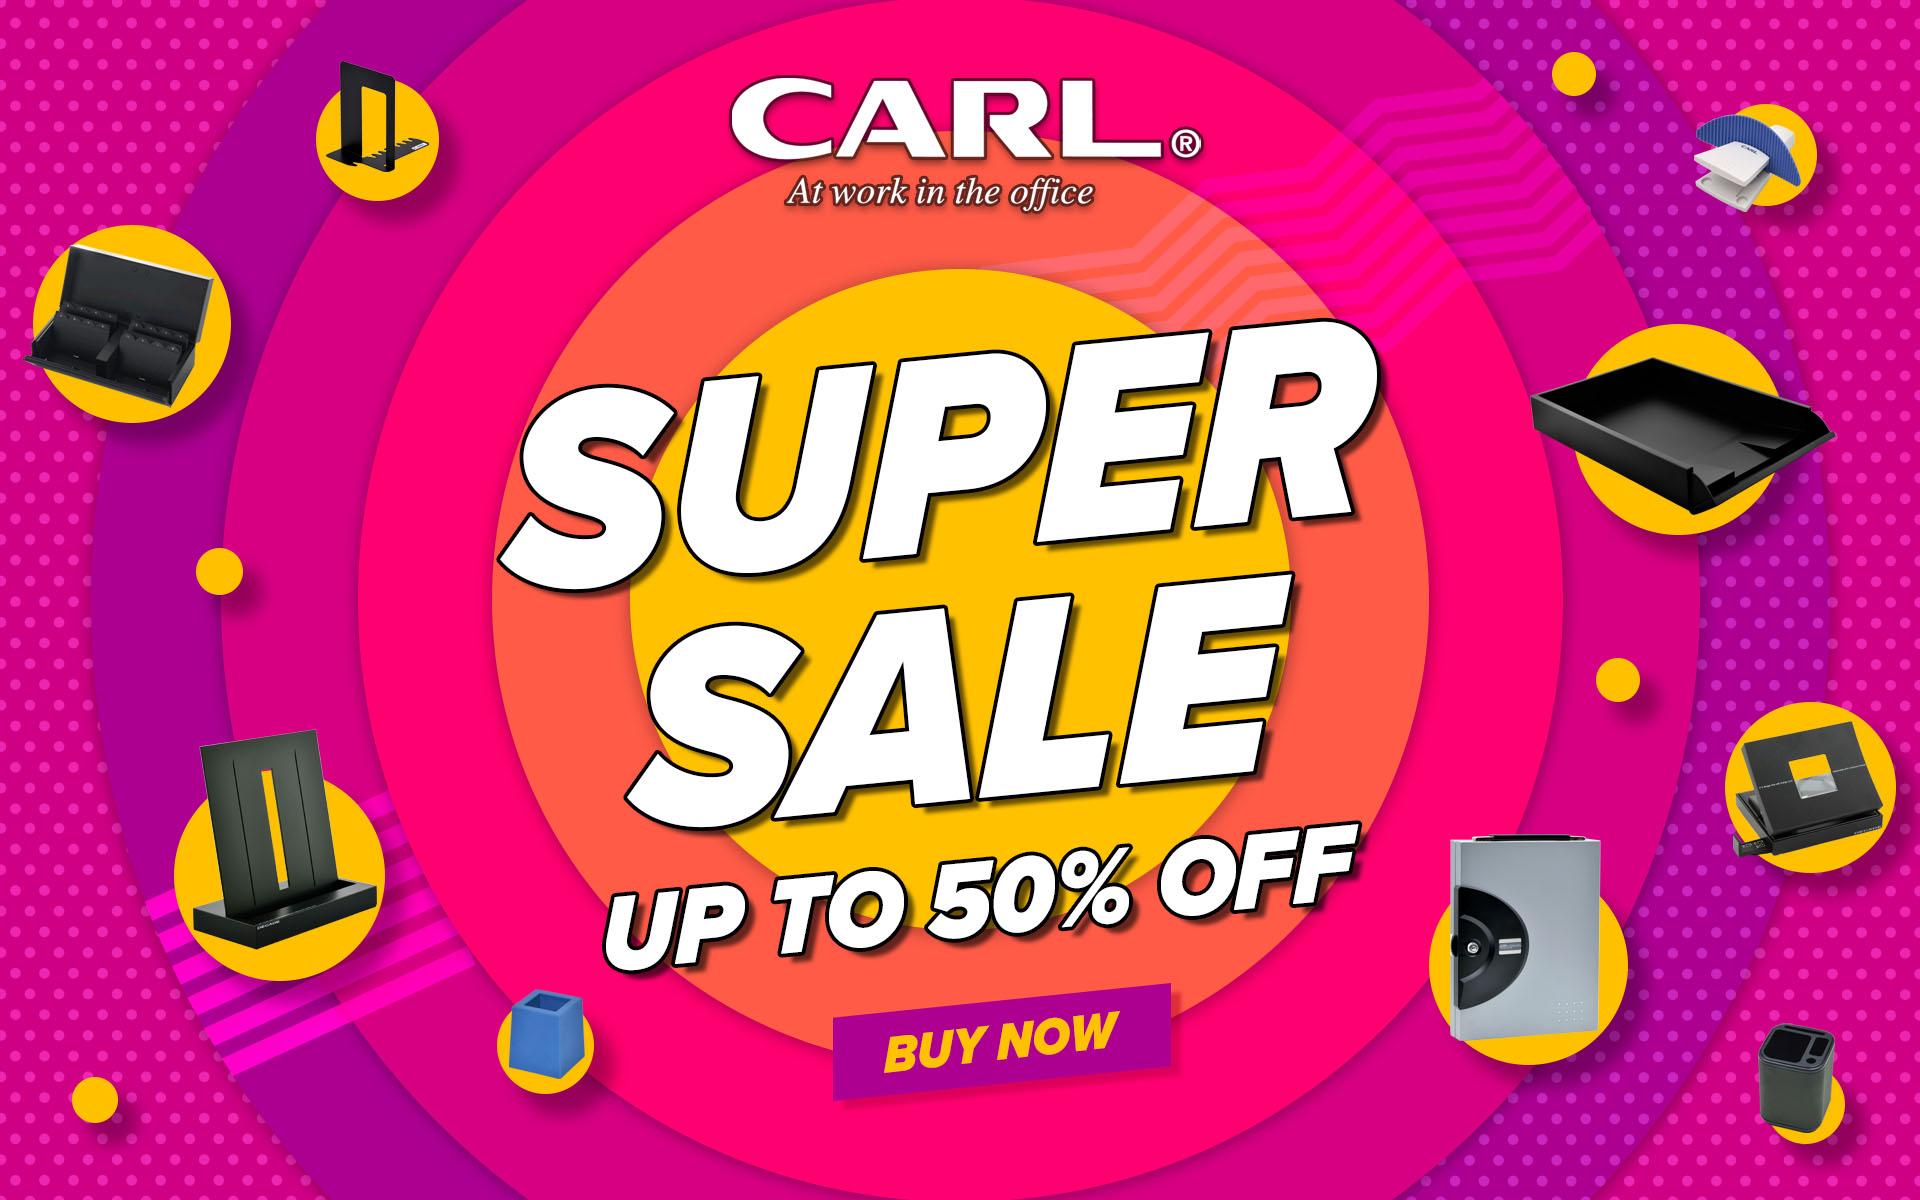 Carl Big Sale